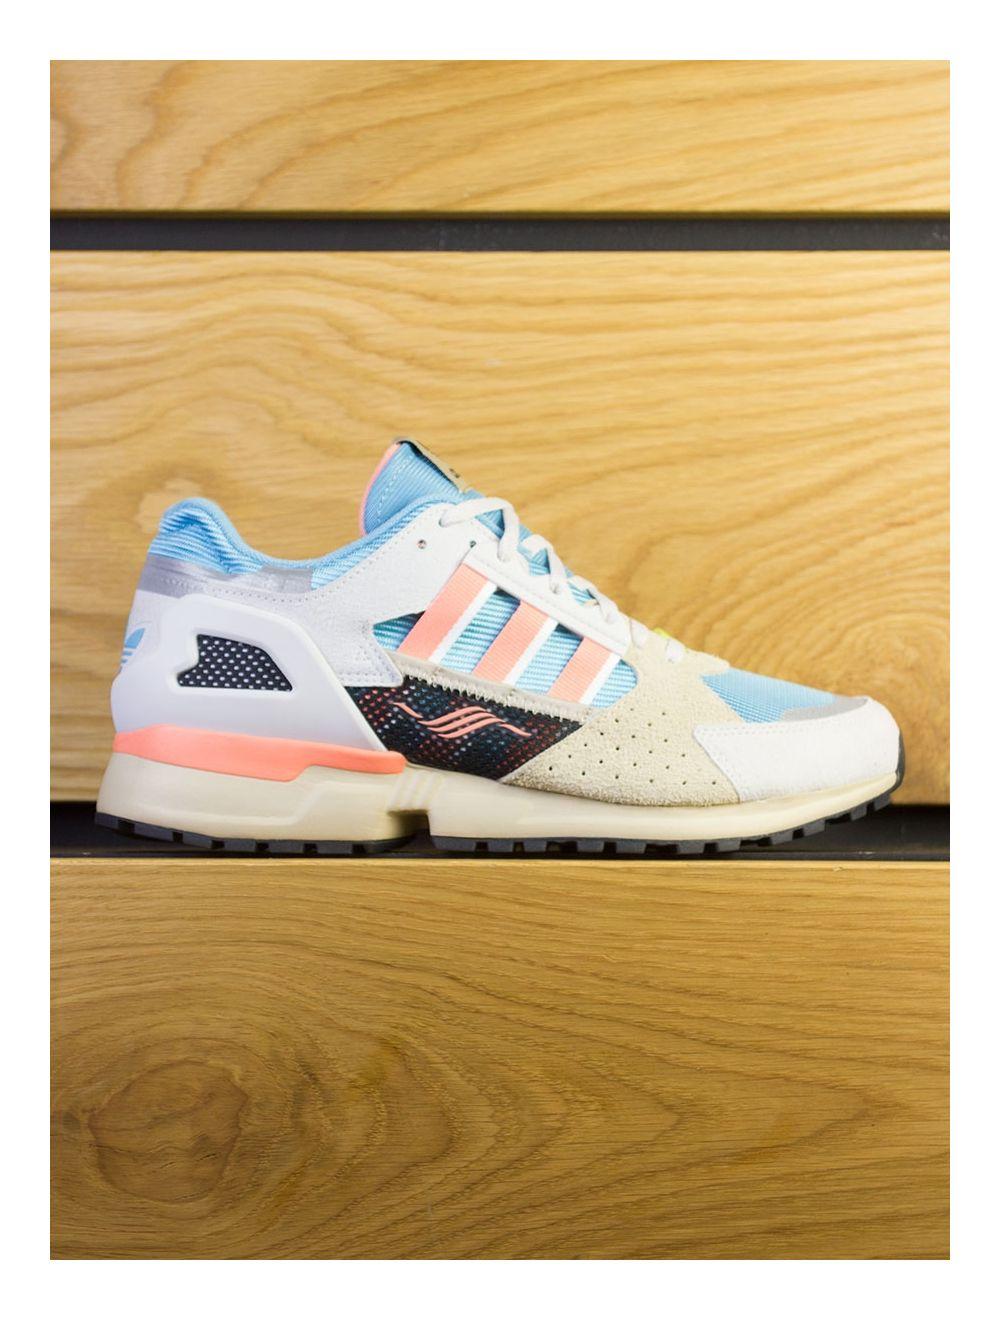 new product b7ac8 780a5 Adidas Consortium ZX 10,000 C Supercolour - Grey Blue Coral Orange